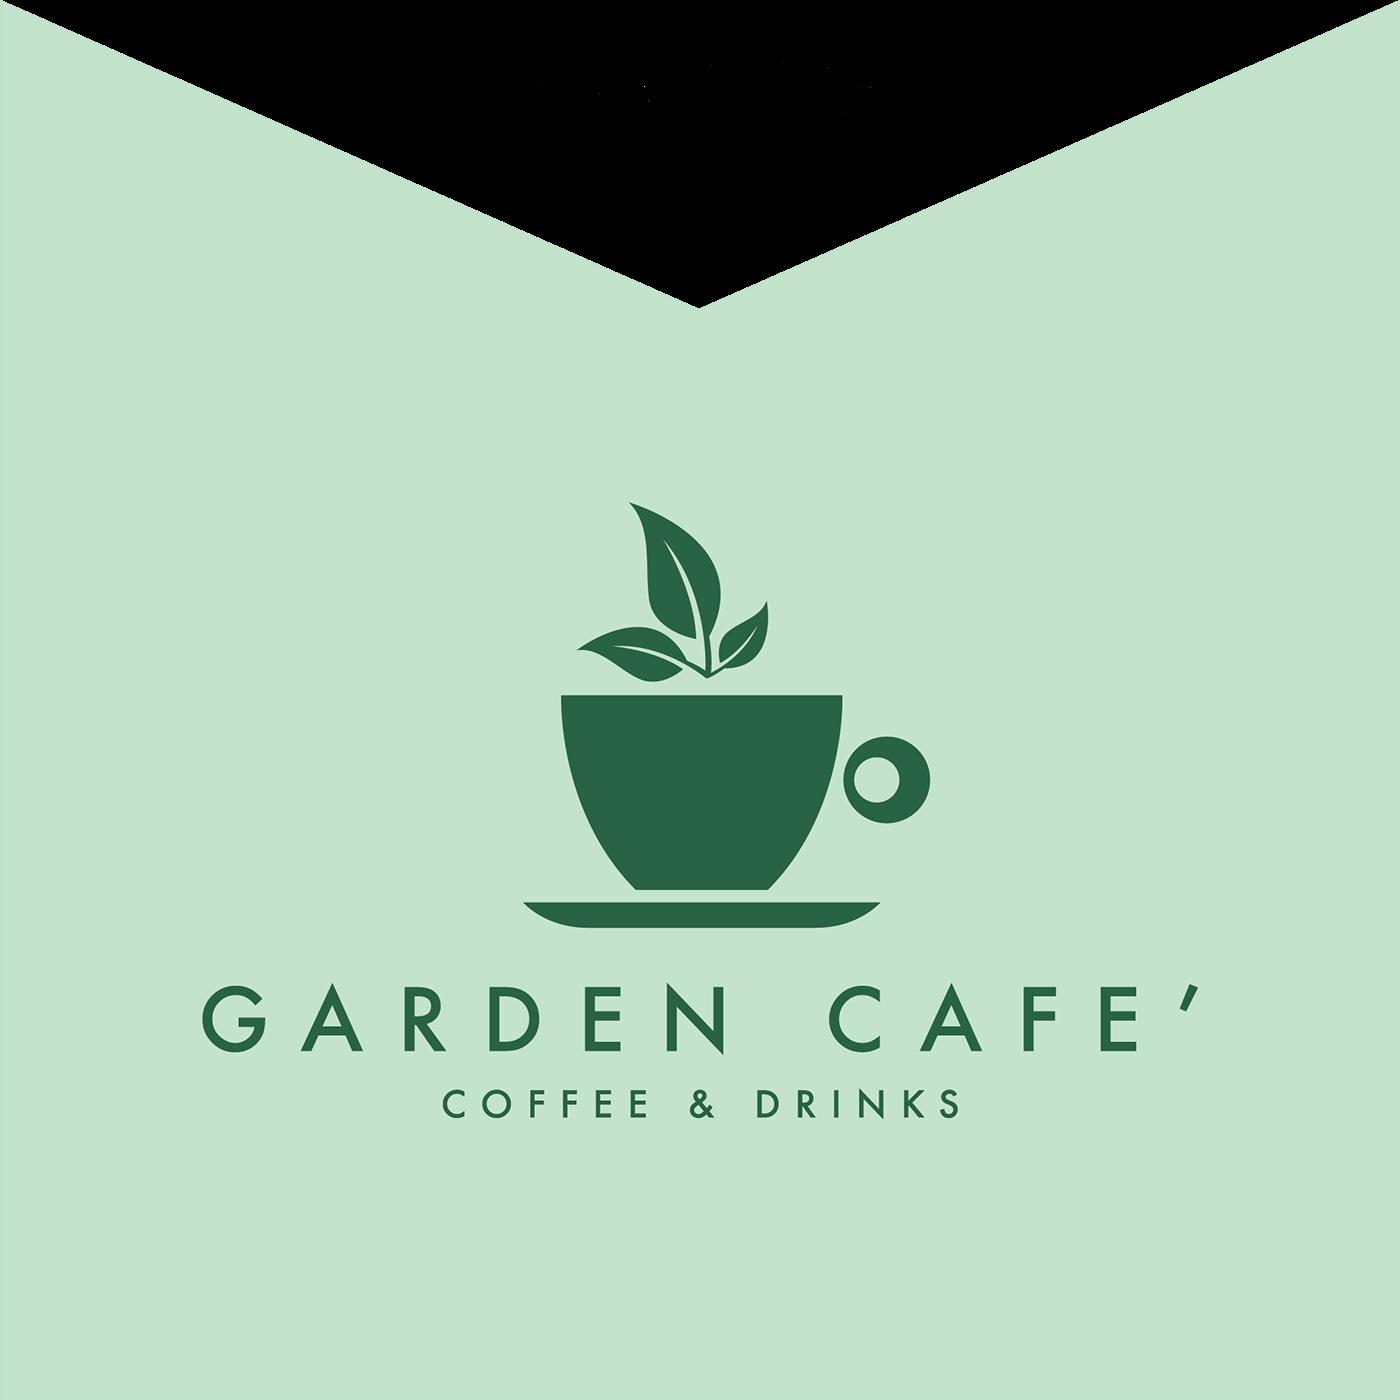 Garden Cafe Logo Design 2017 On Behance